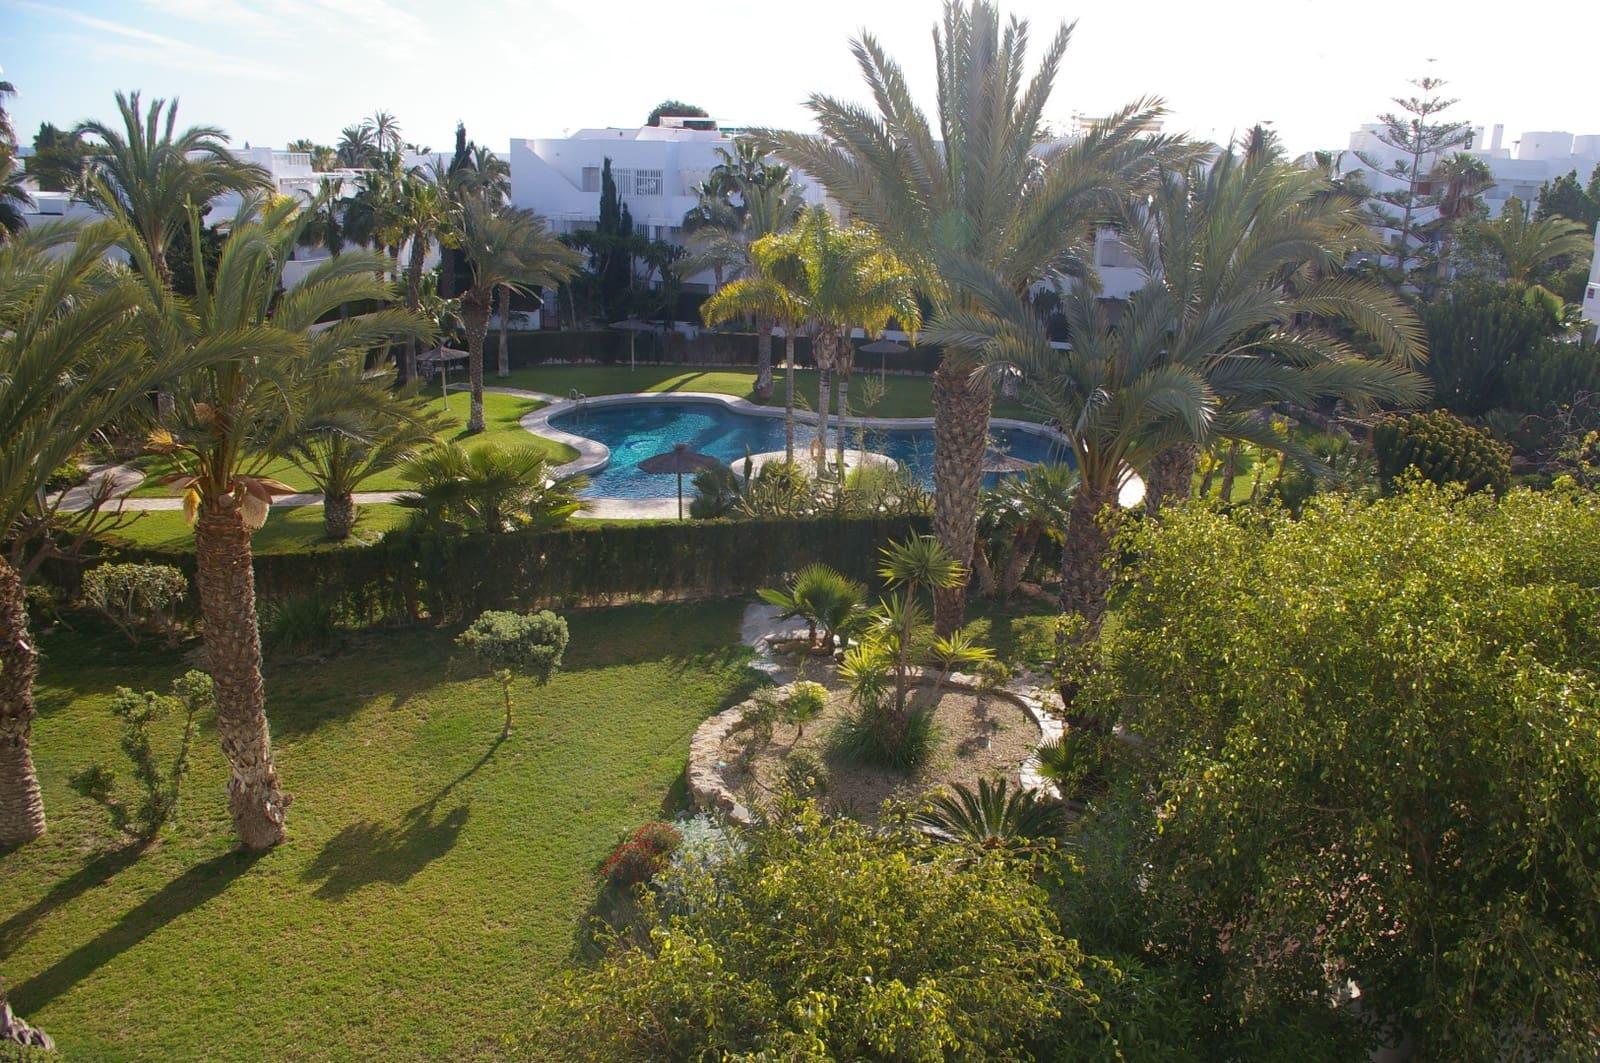 2 bedroom Flat for holiday rental in Puerto del Rey with pool garage - € 600 (Ref: 5077123)